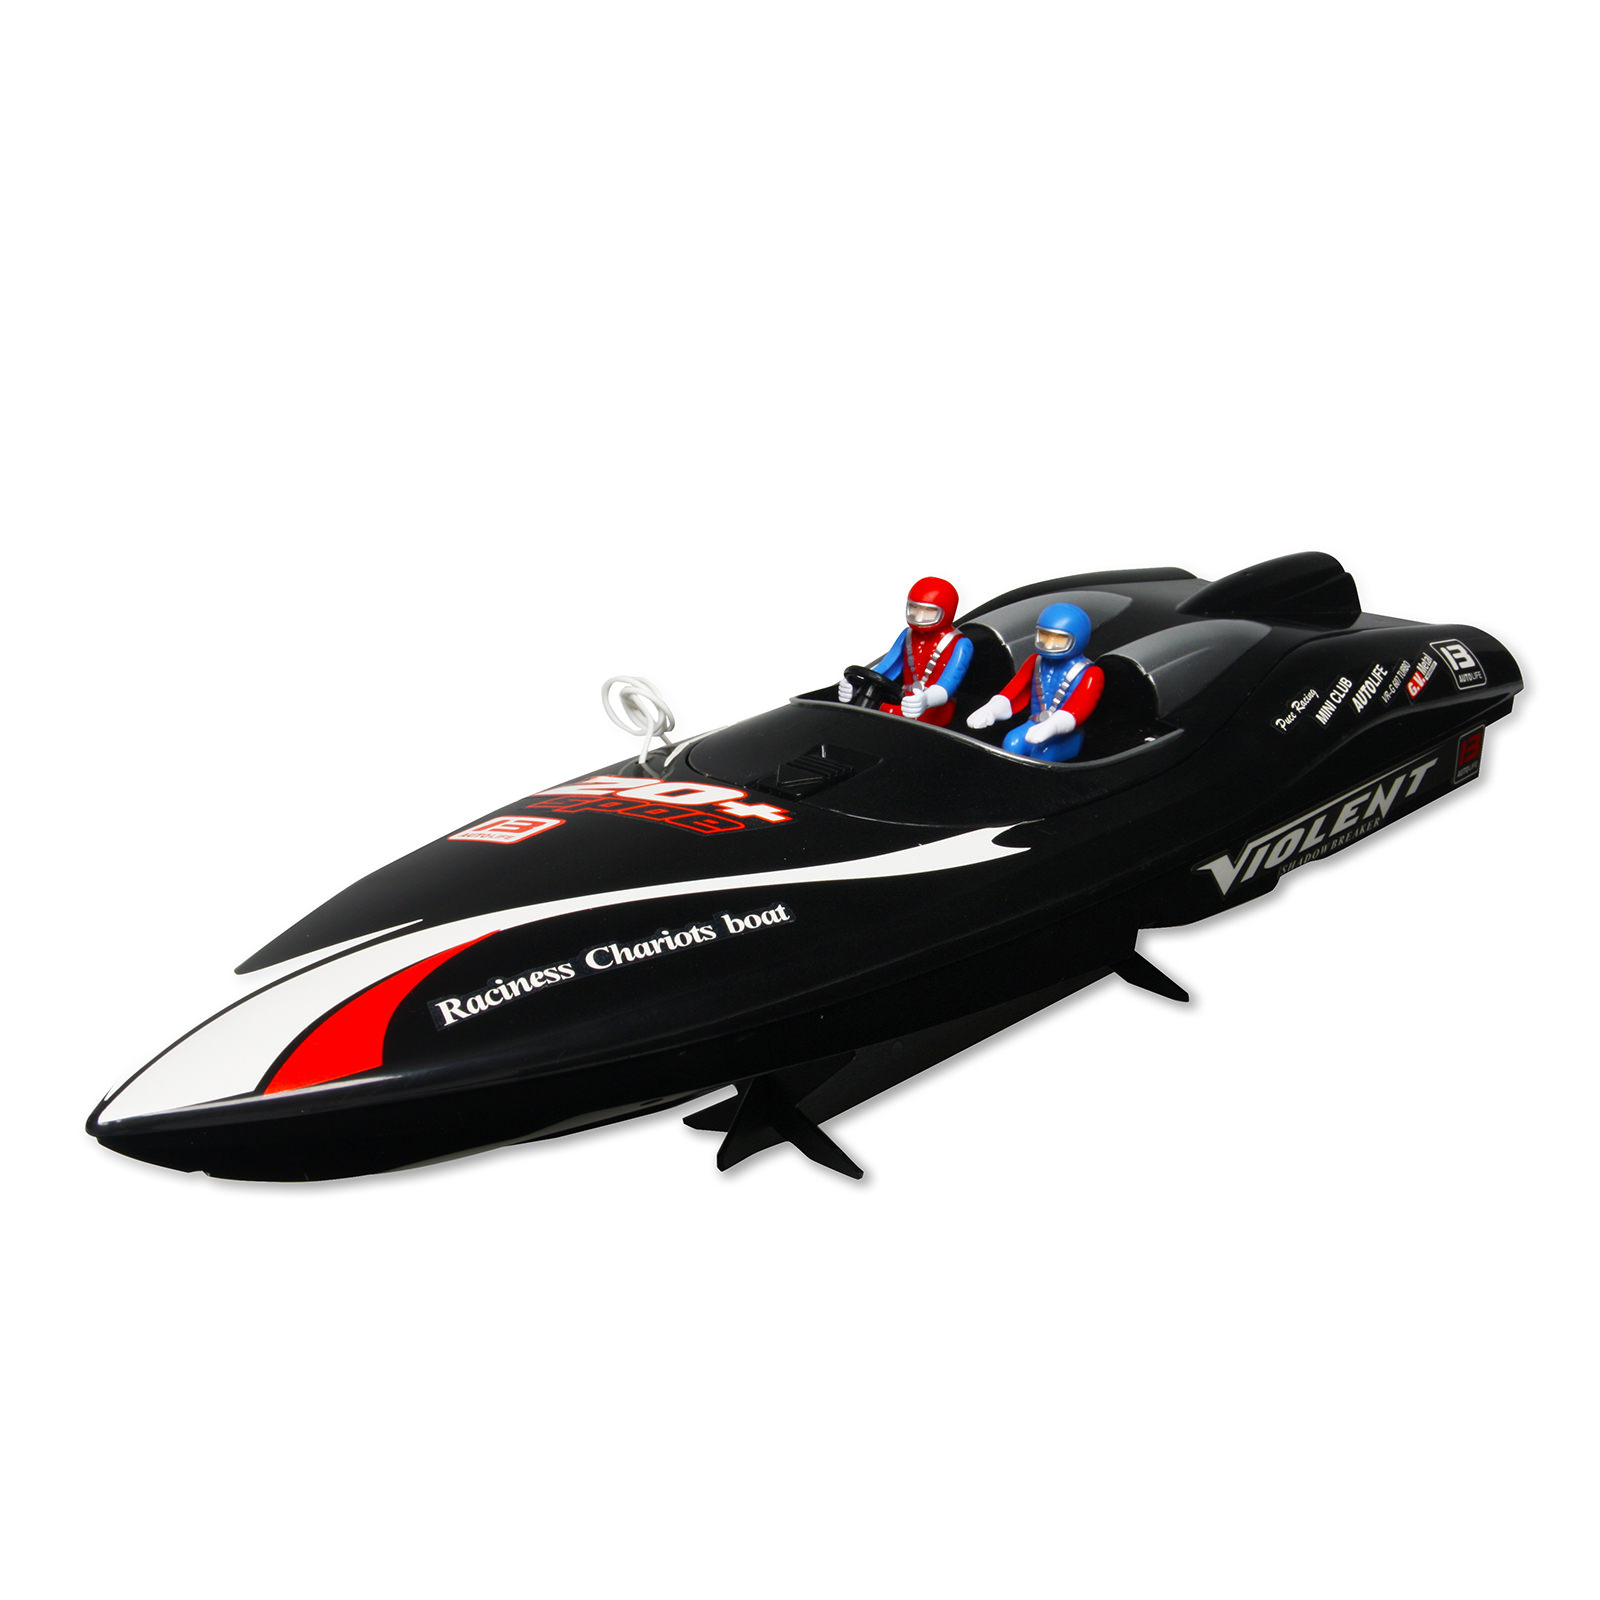 2011 9 Violent Shadow Breaker Black Rc Speed Boat At Hobby